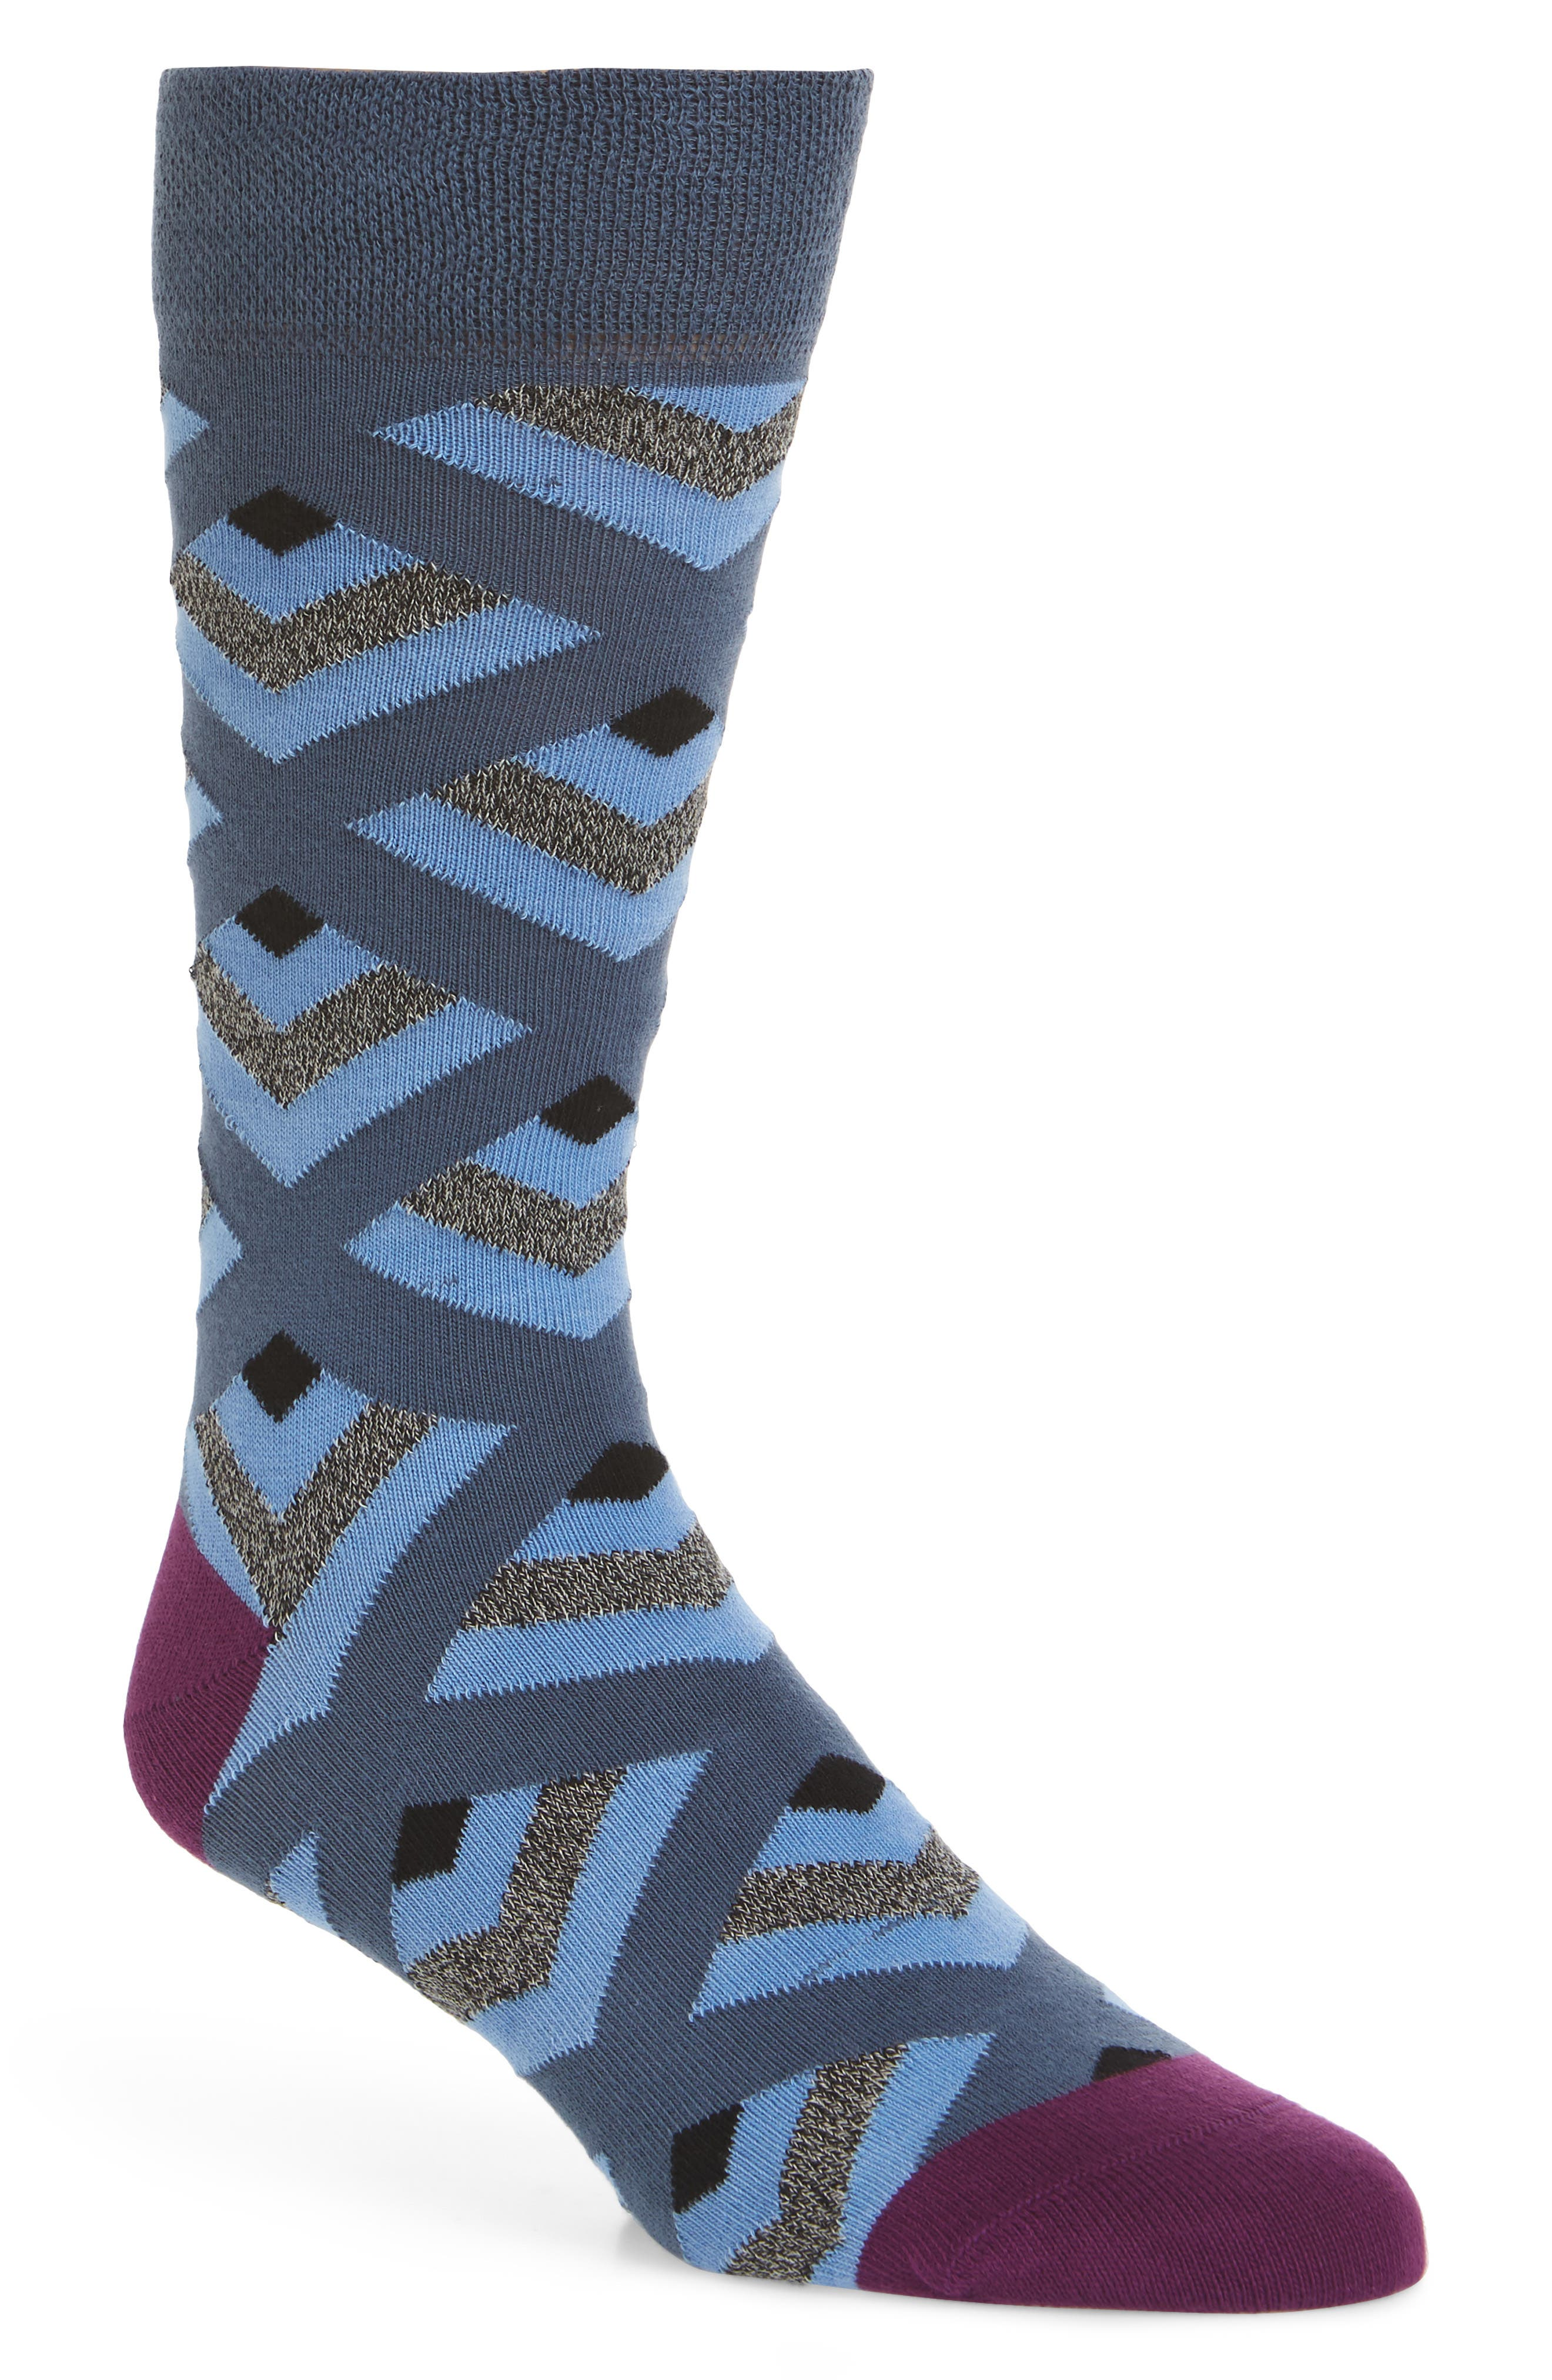 Ram Geometric Socks,                         Main,                         color, 421